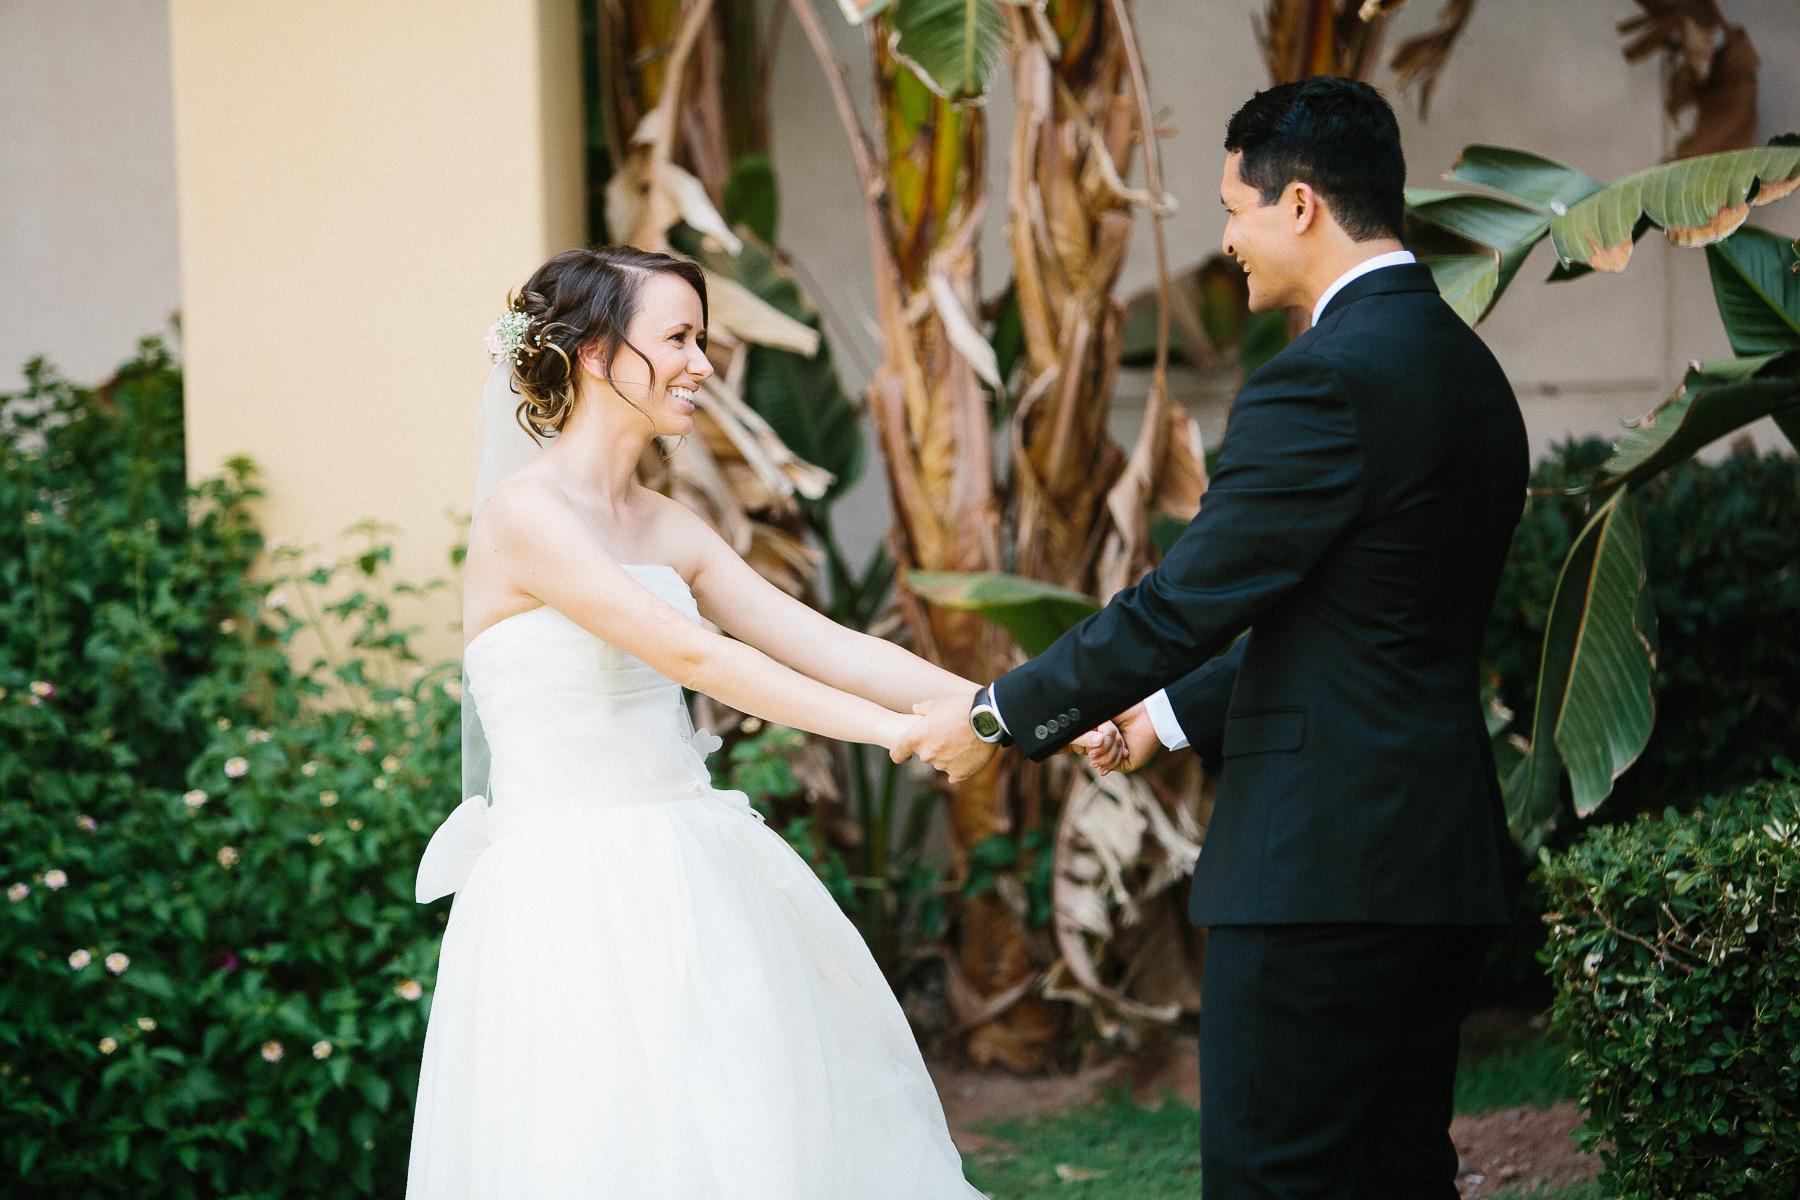 170708-Luxium-Weddings-Arizona-Sheraton-Phoenix-Arizona-Photographer-Hilton-Hawaiian-1007.jpg